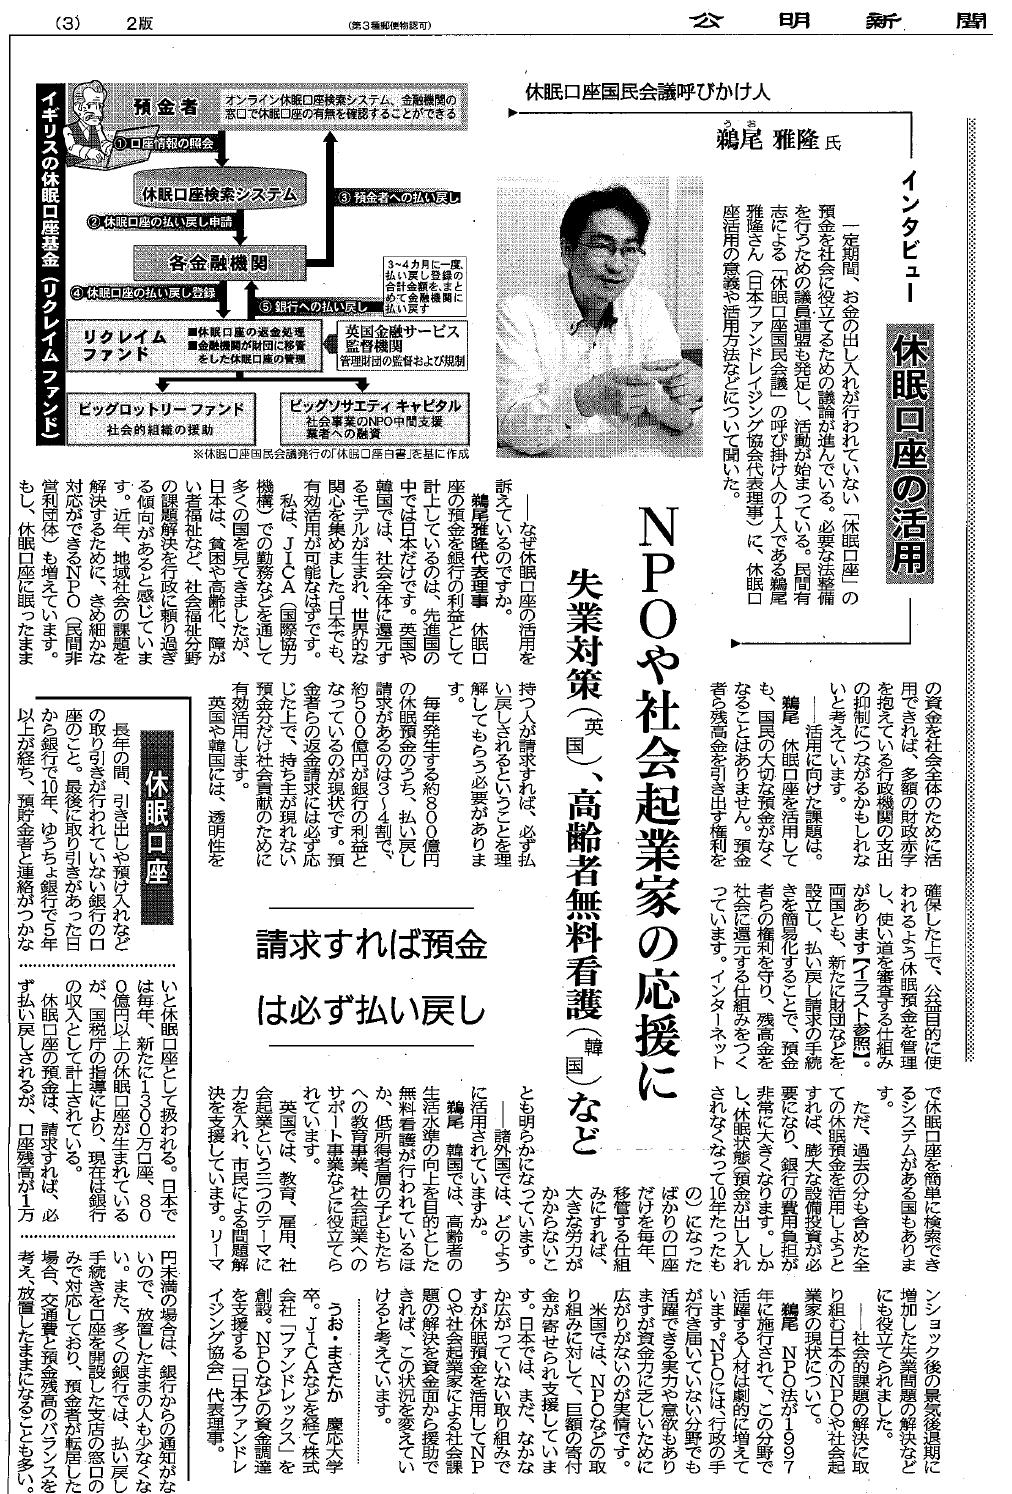 http://kyumin.jp/media/140825%20komei.png